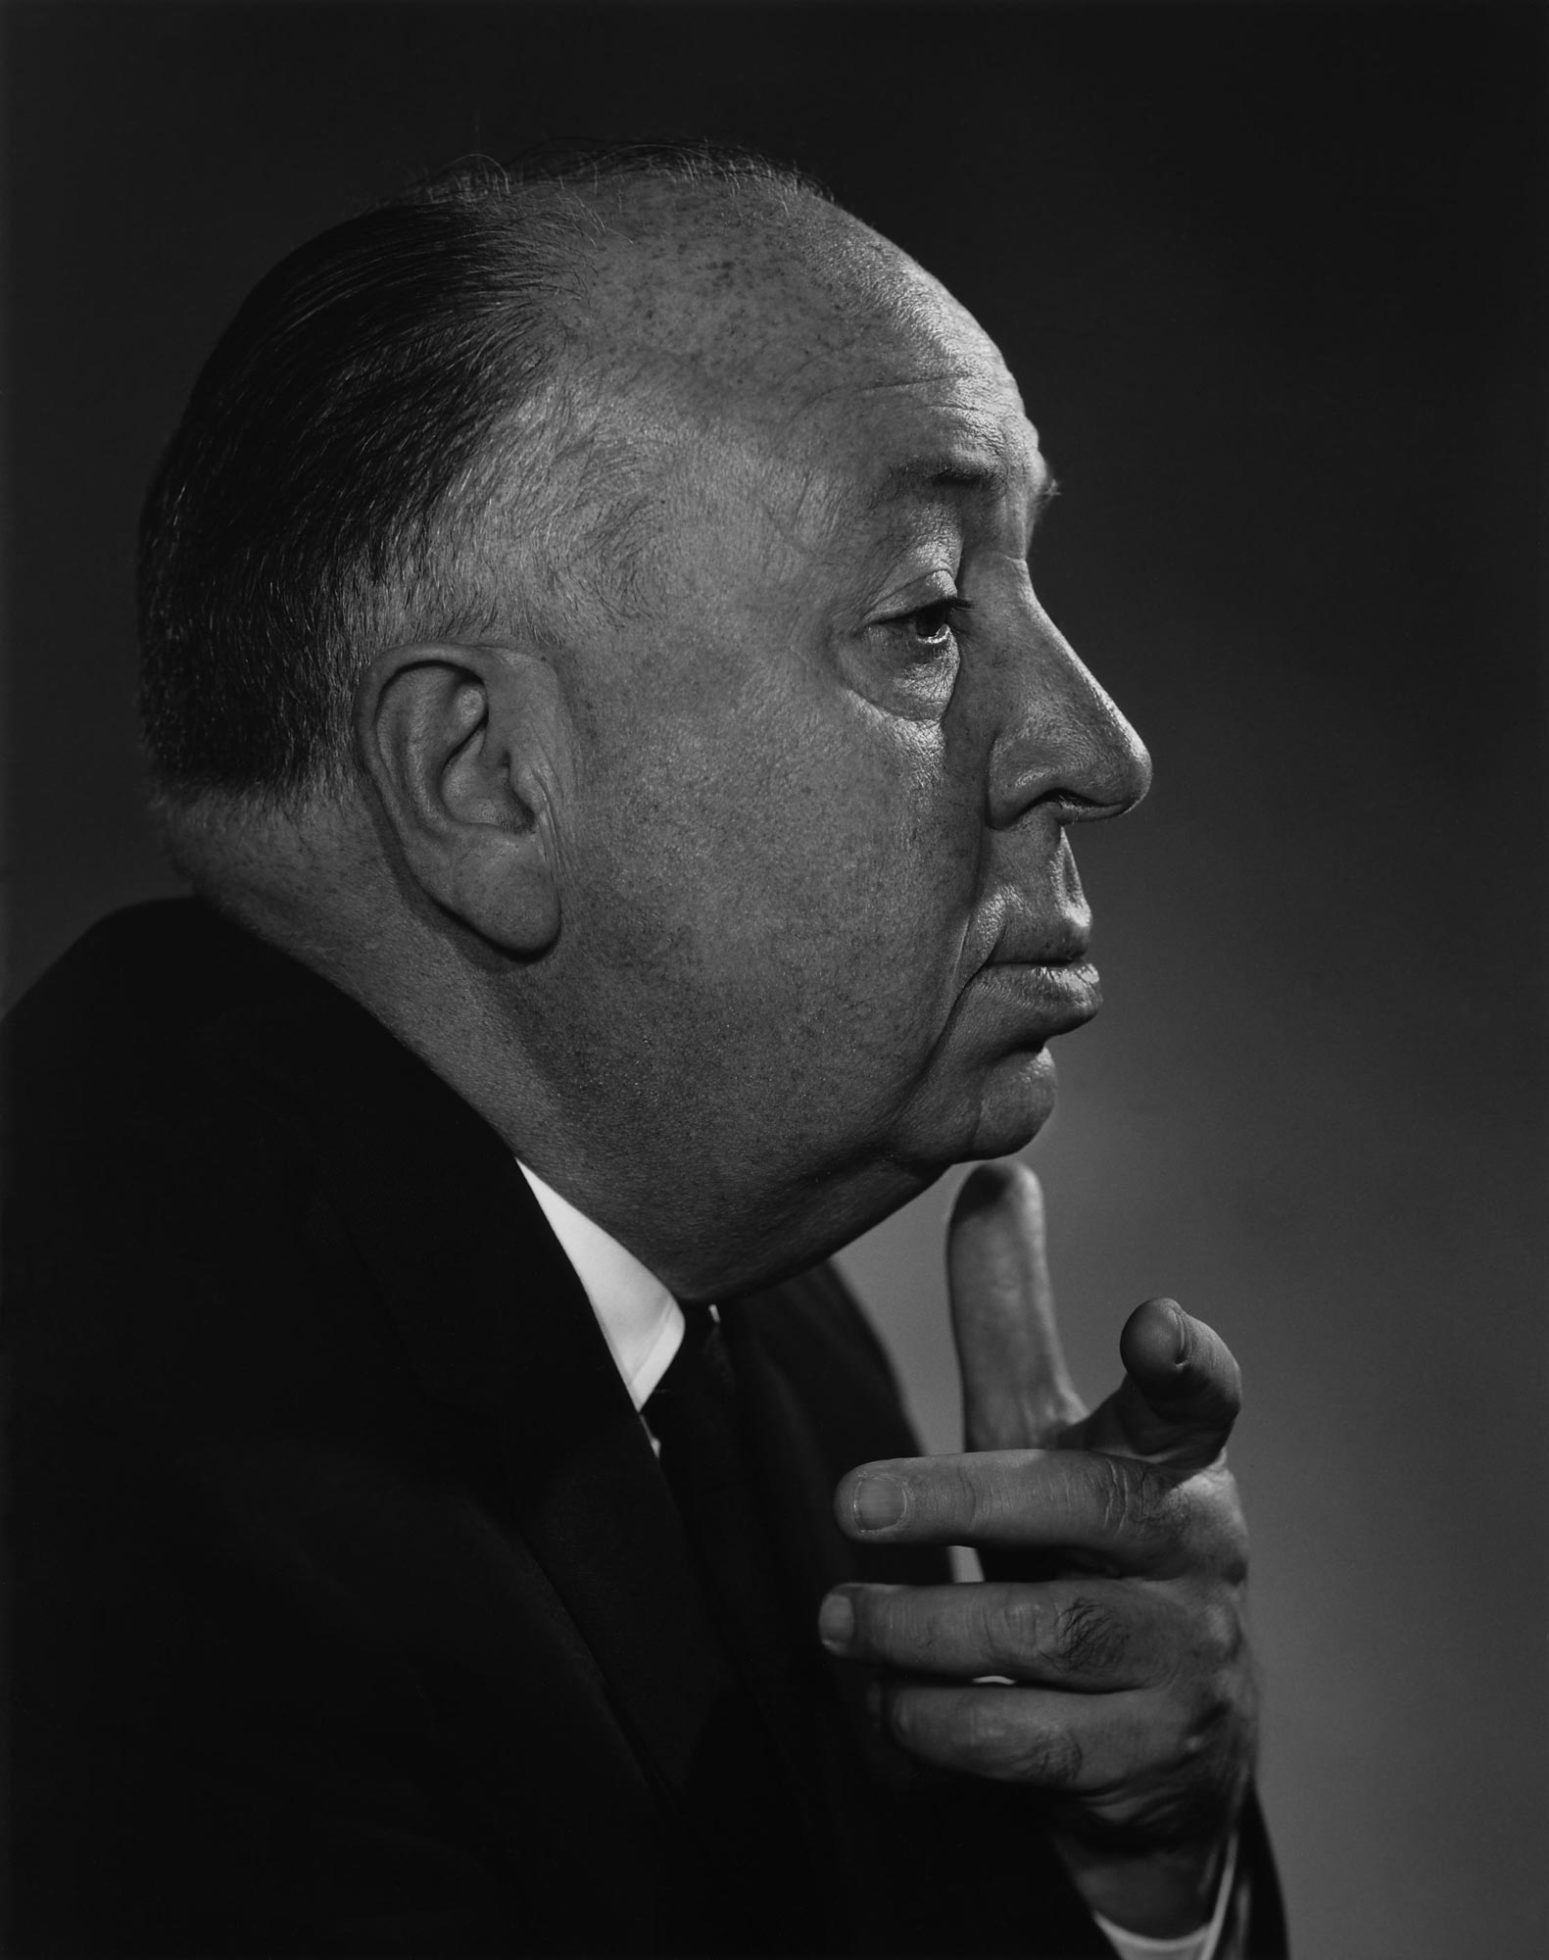 Fotó: Yousuf Karsh: Alfred Hitchcock, 1960 © Yousuf Karsh